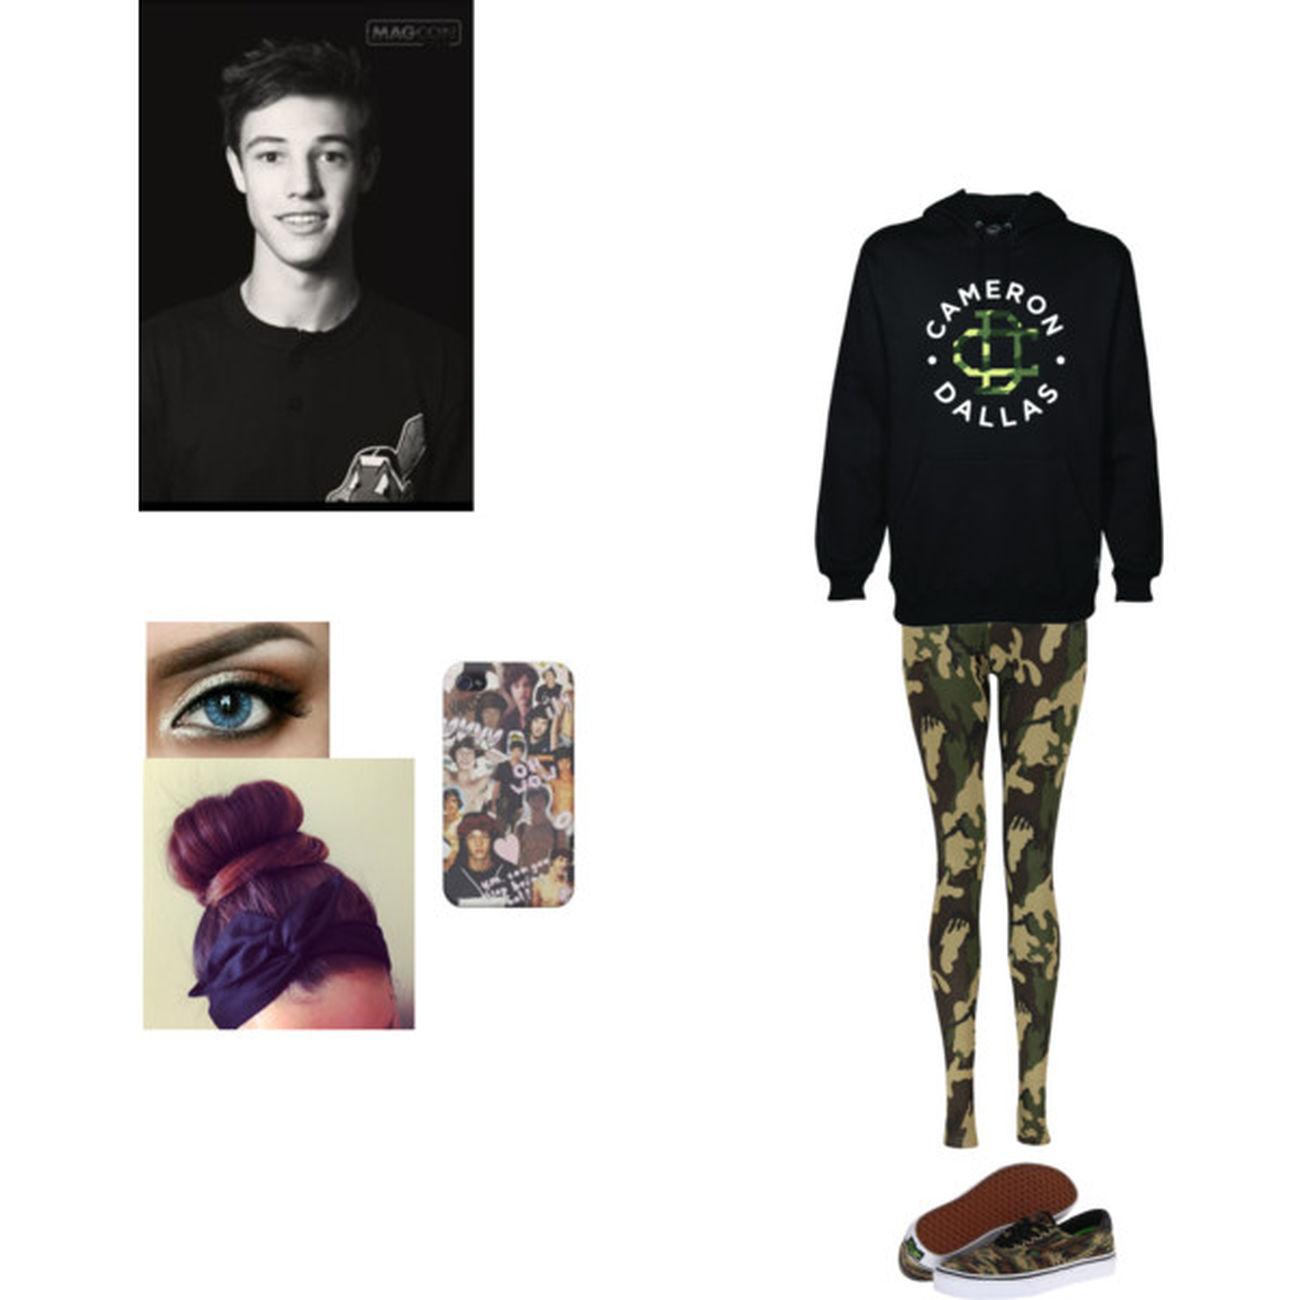 Quiero ese buzo y a Cameron My Polyvore ^.< Cameron Dallas❤ Beautiful ♥ Polyvore #fashion #mycreation #lovetostyle